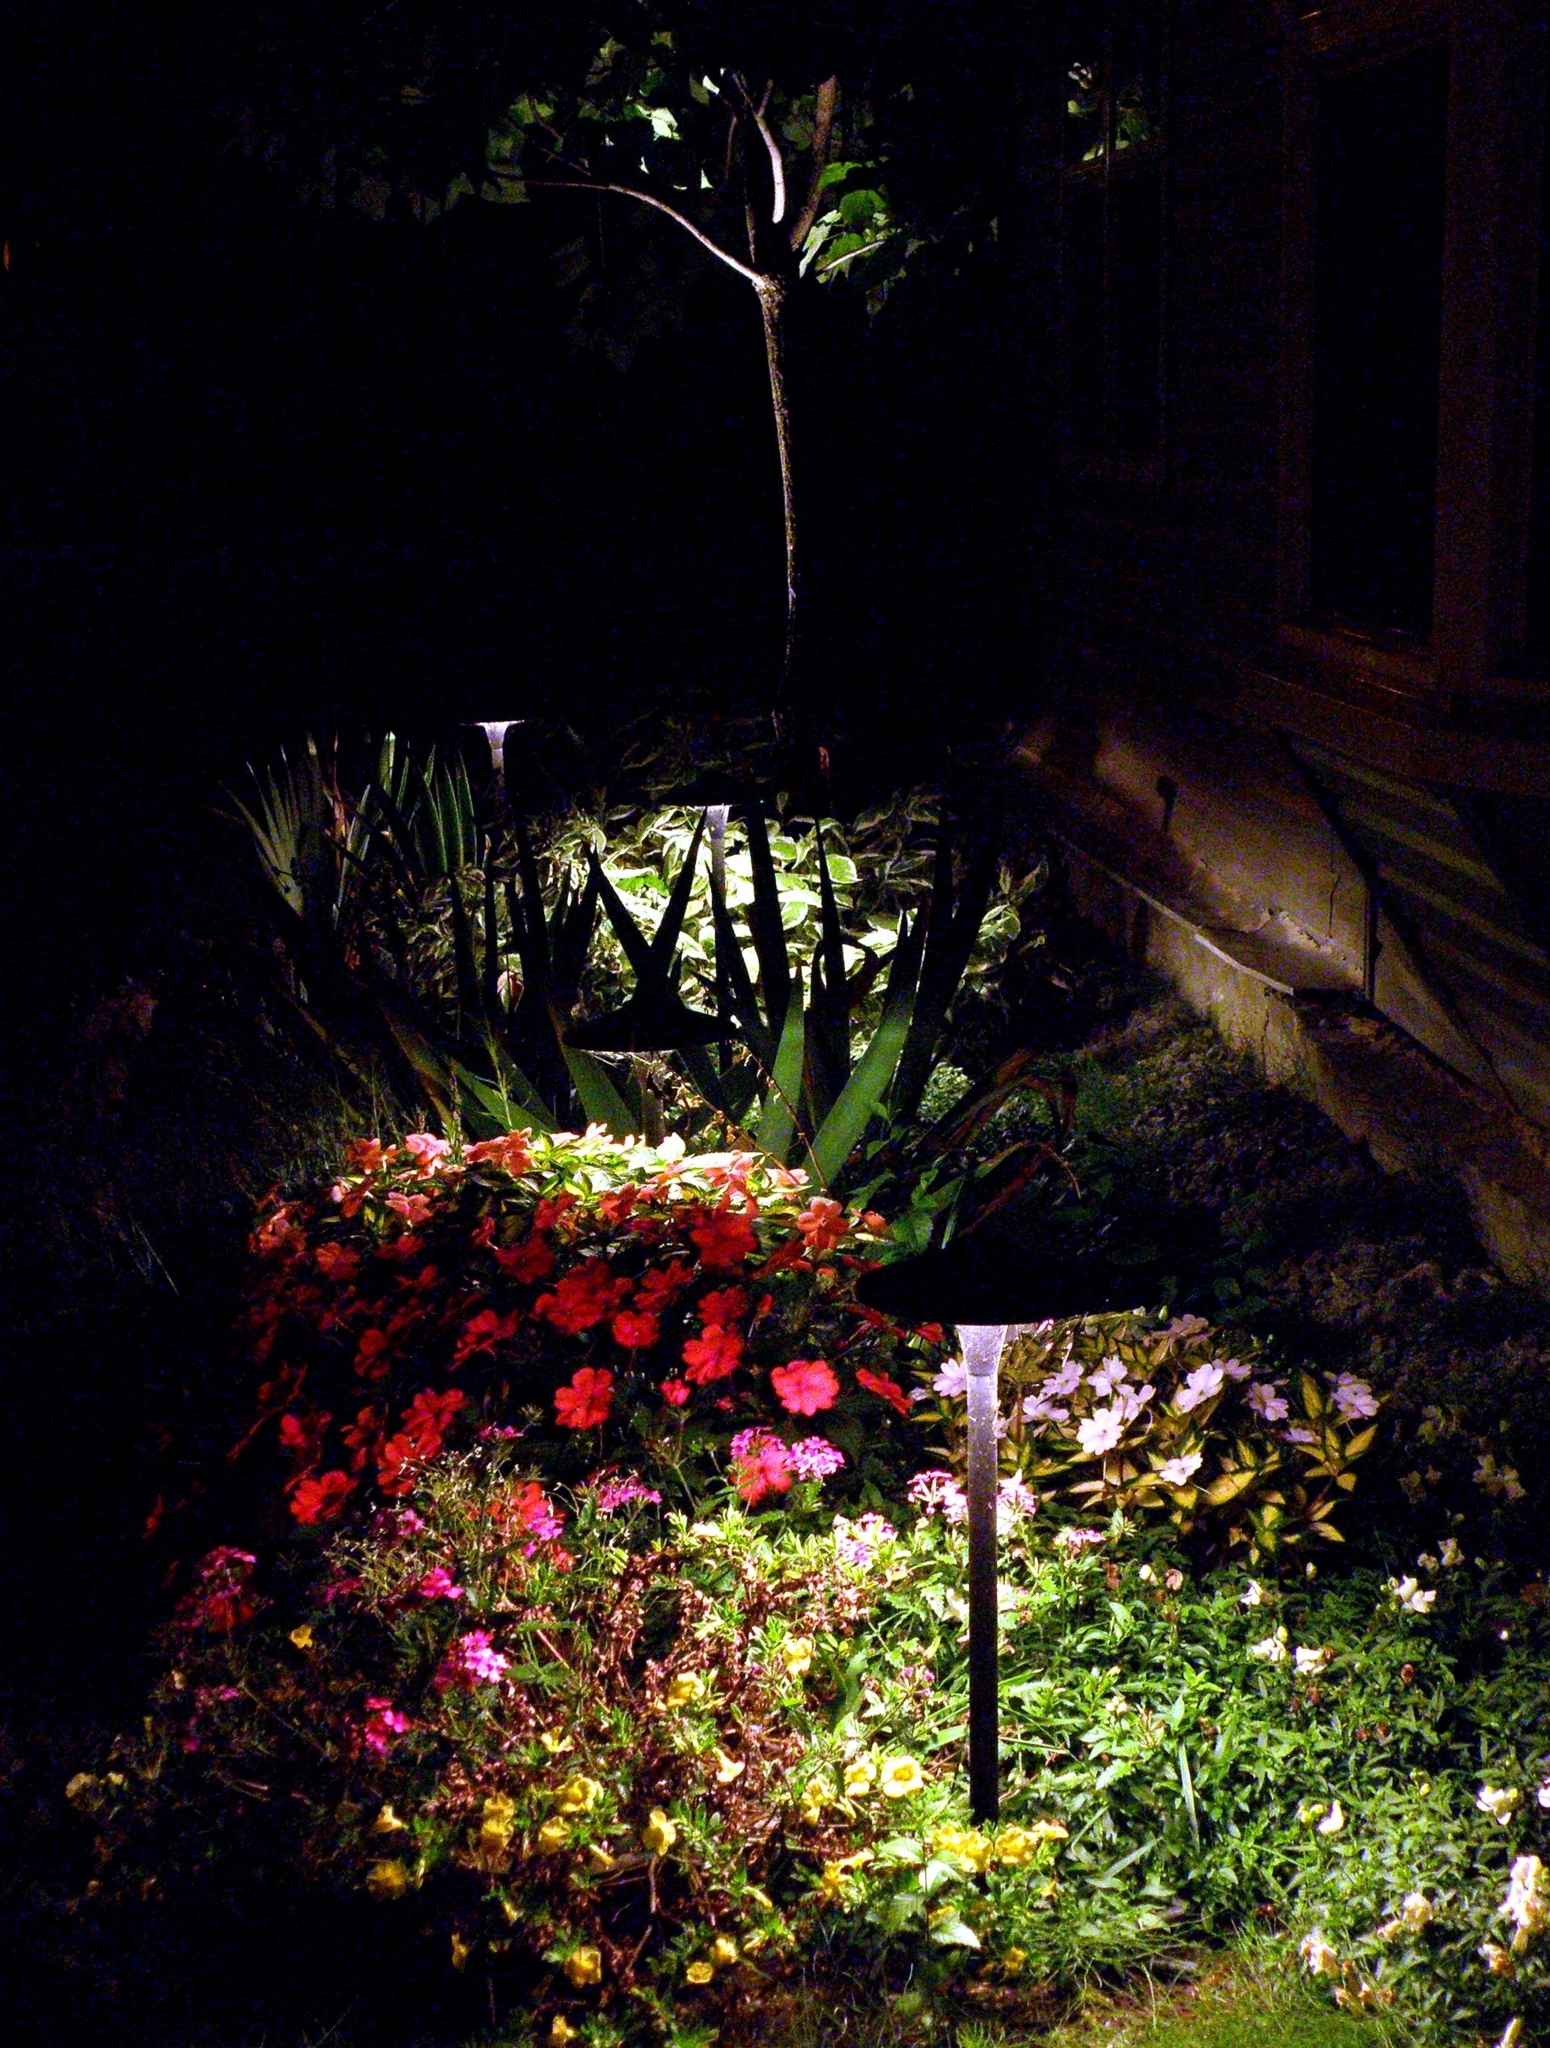 Mansewood irrigation and landscape lighting : Illustrious irrigation and landscape lighting keswick on